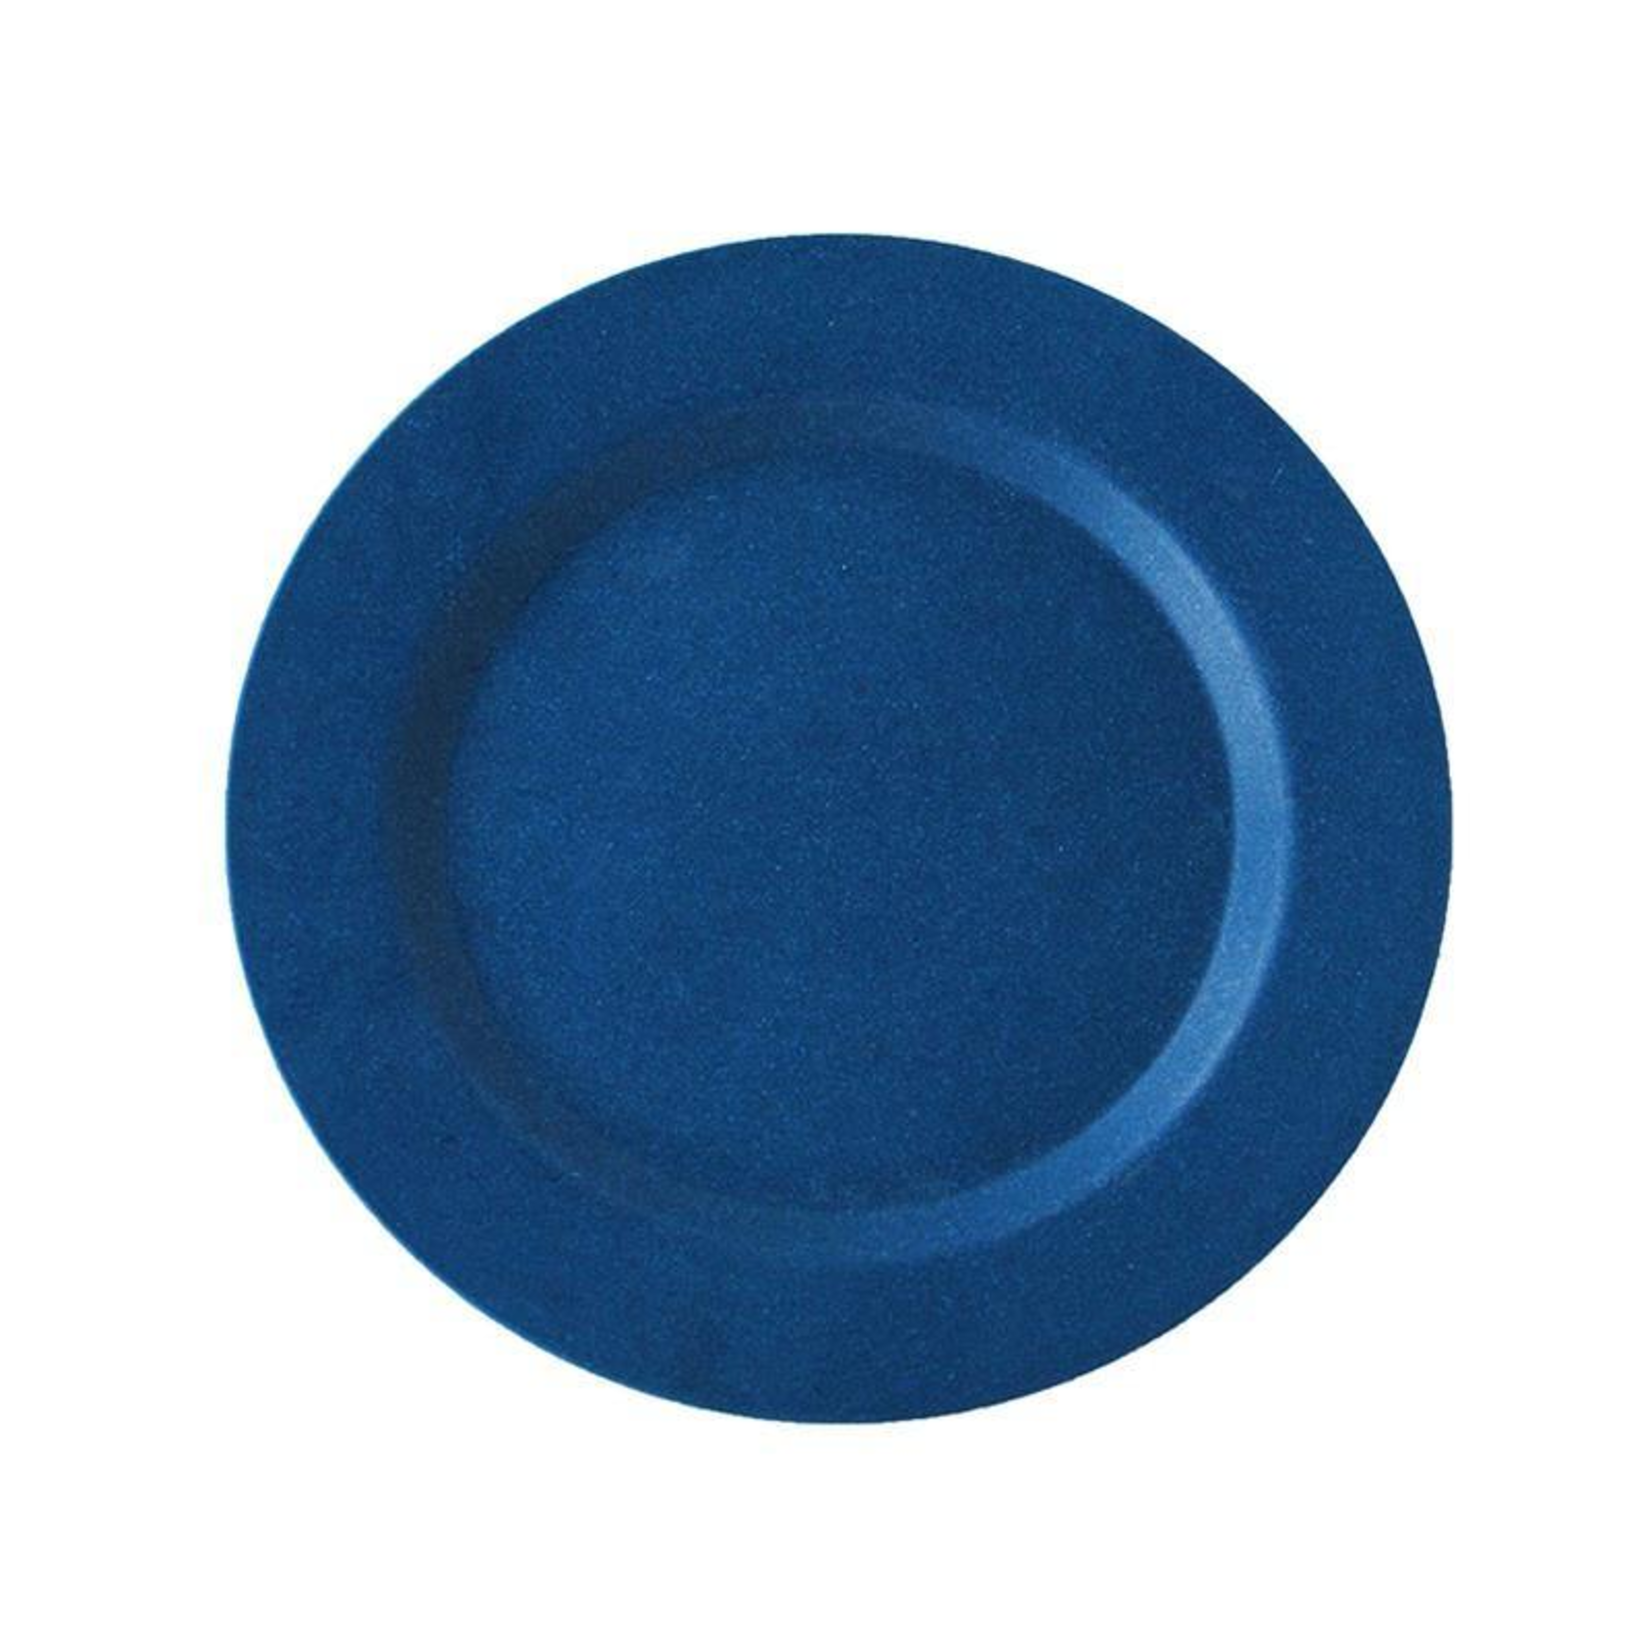 EcoSoulife EcoSoulife Plate 20cm